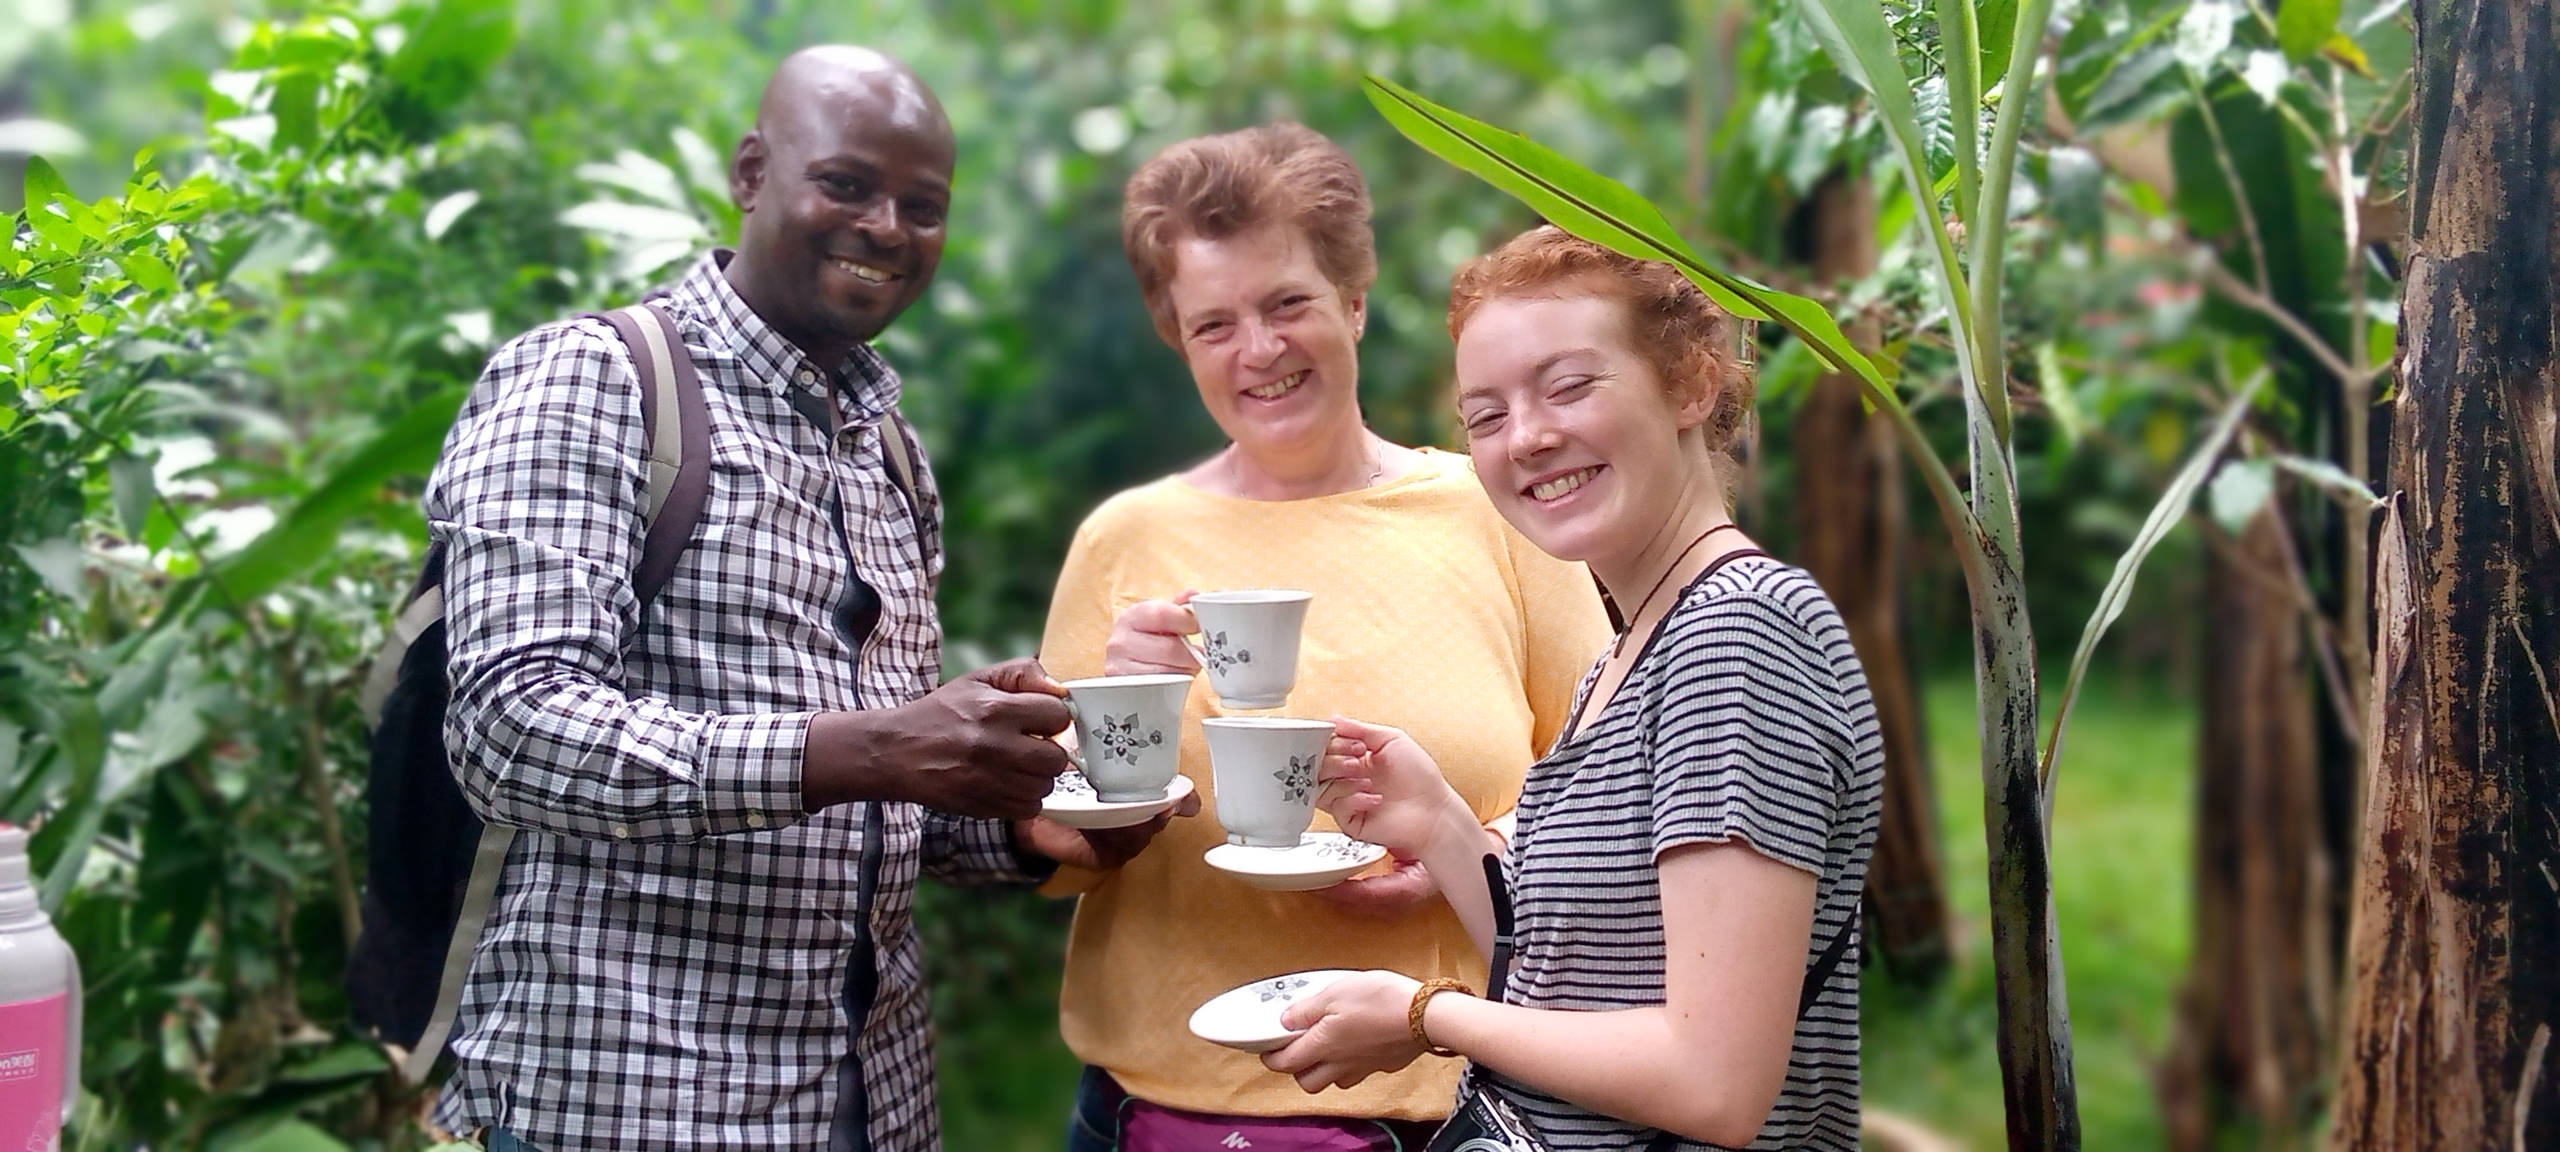 Rombo Cultural Tourism Enterprise, Nicholaus Kavishe, Kilimanjaro, Tanzania